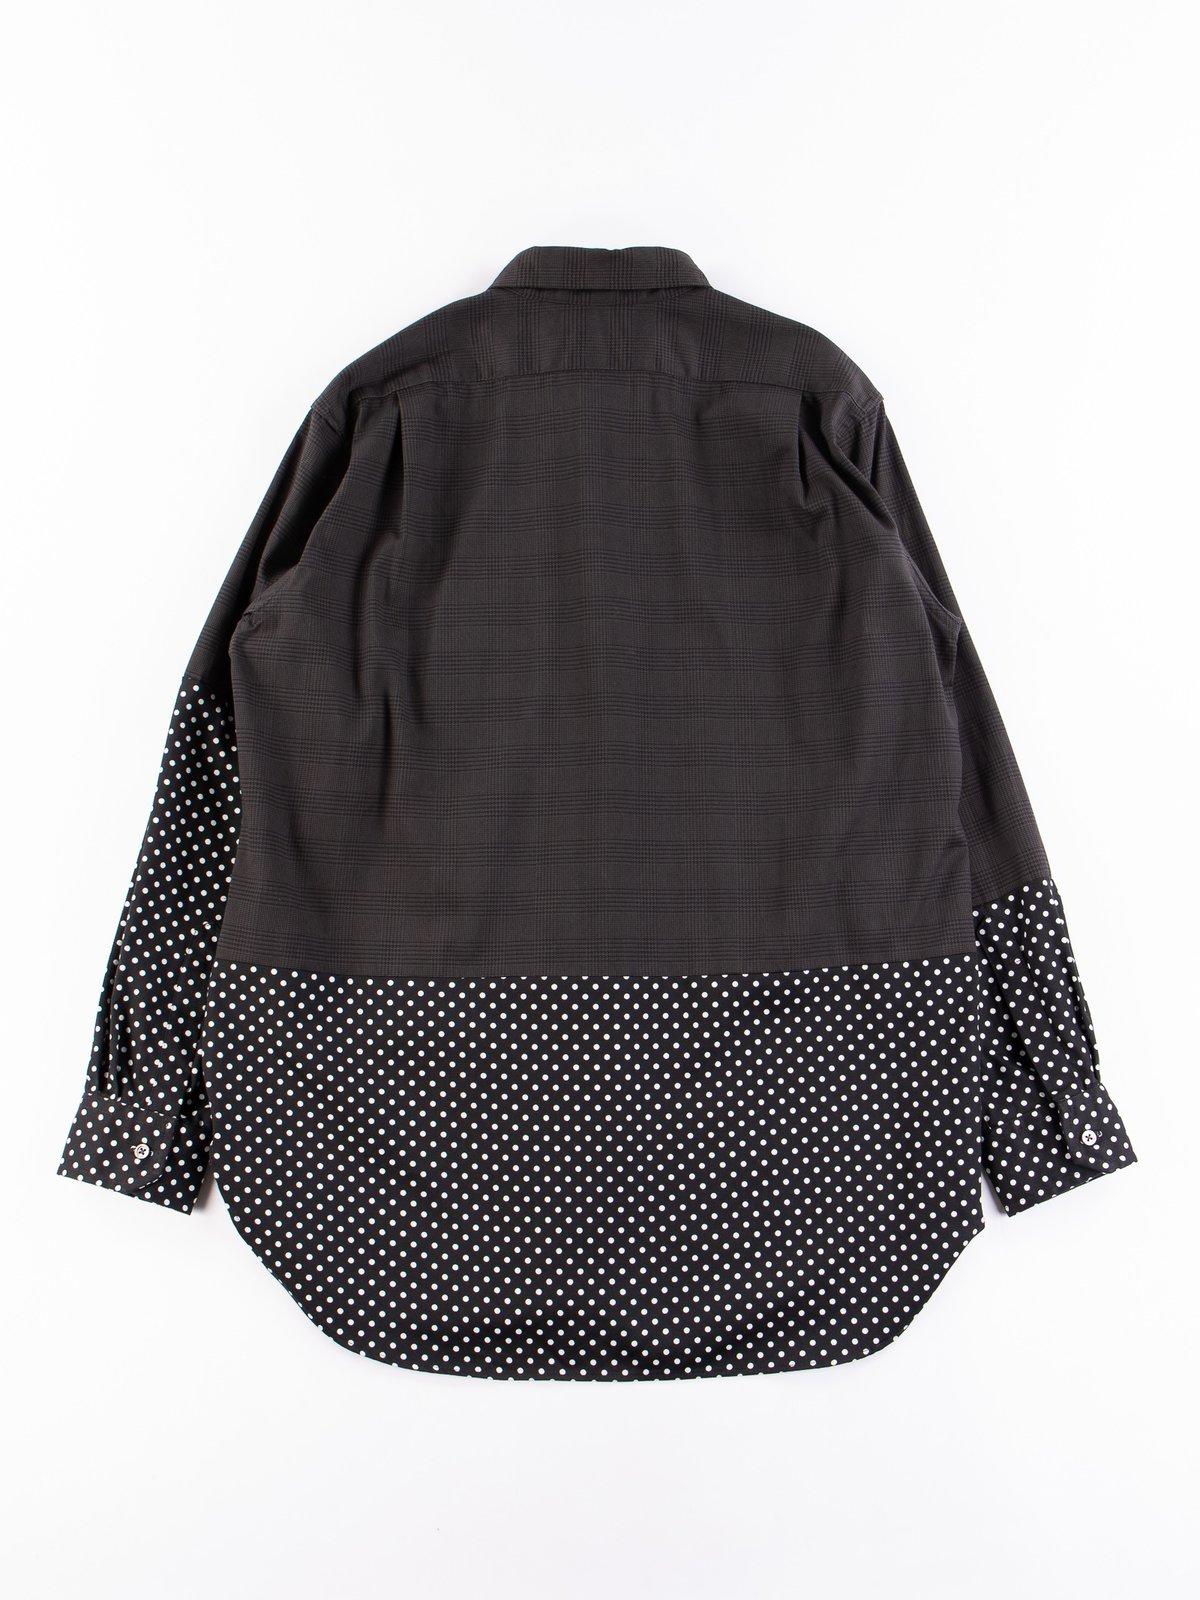 Grey Twill Printed Glen Plaid Spread Collar Shirt - Image 5